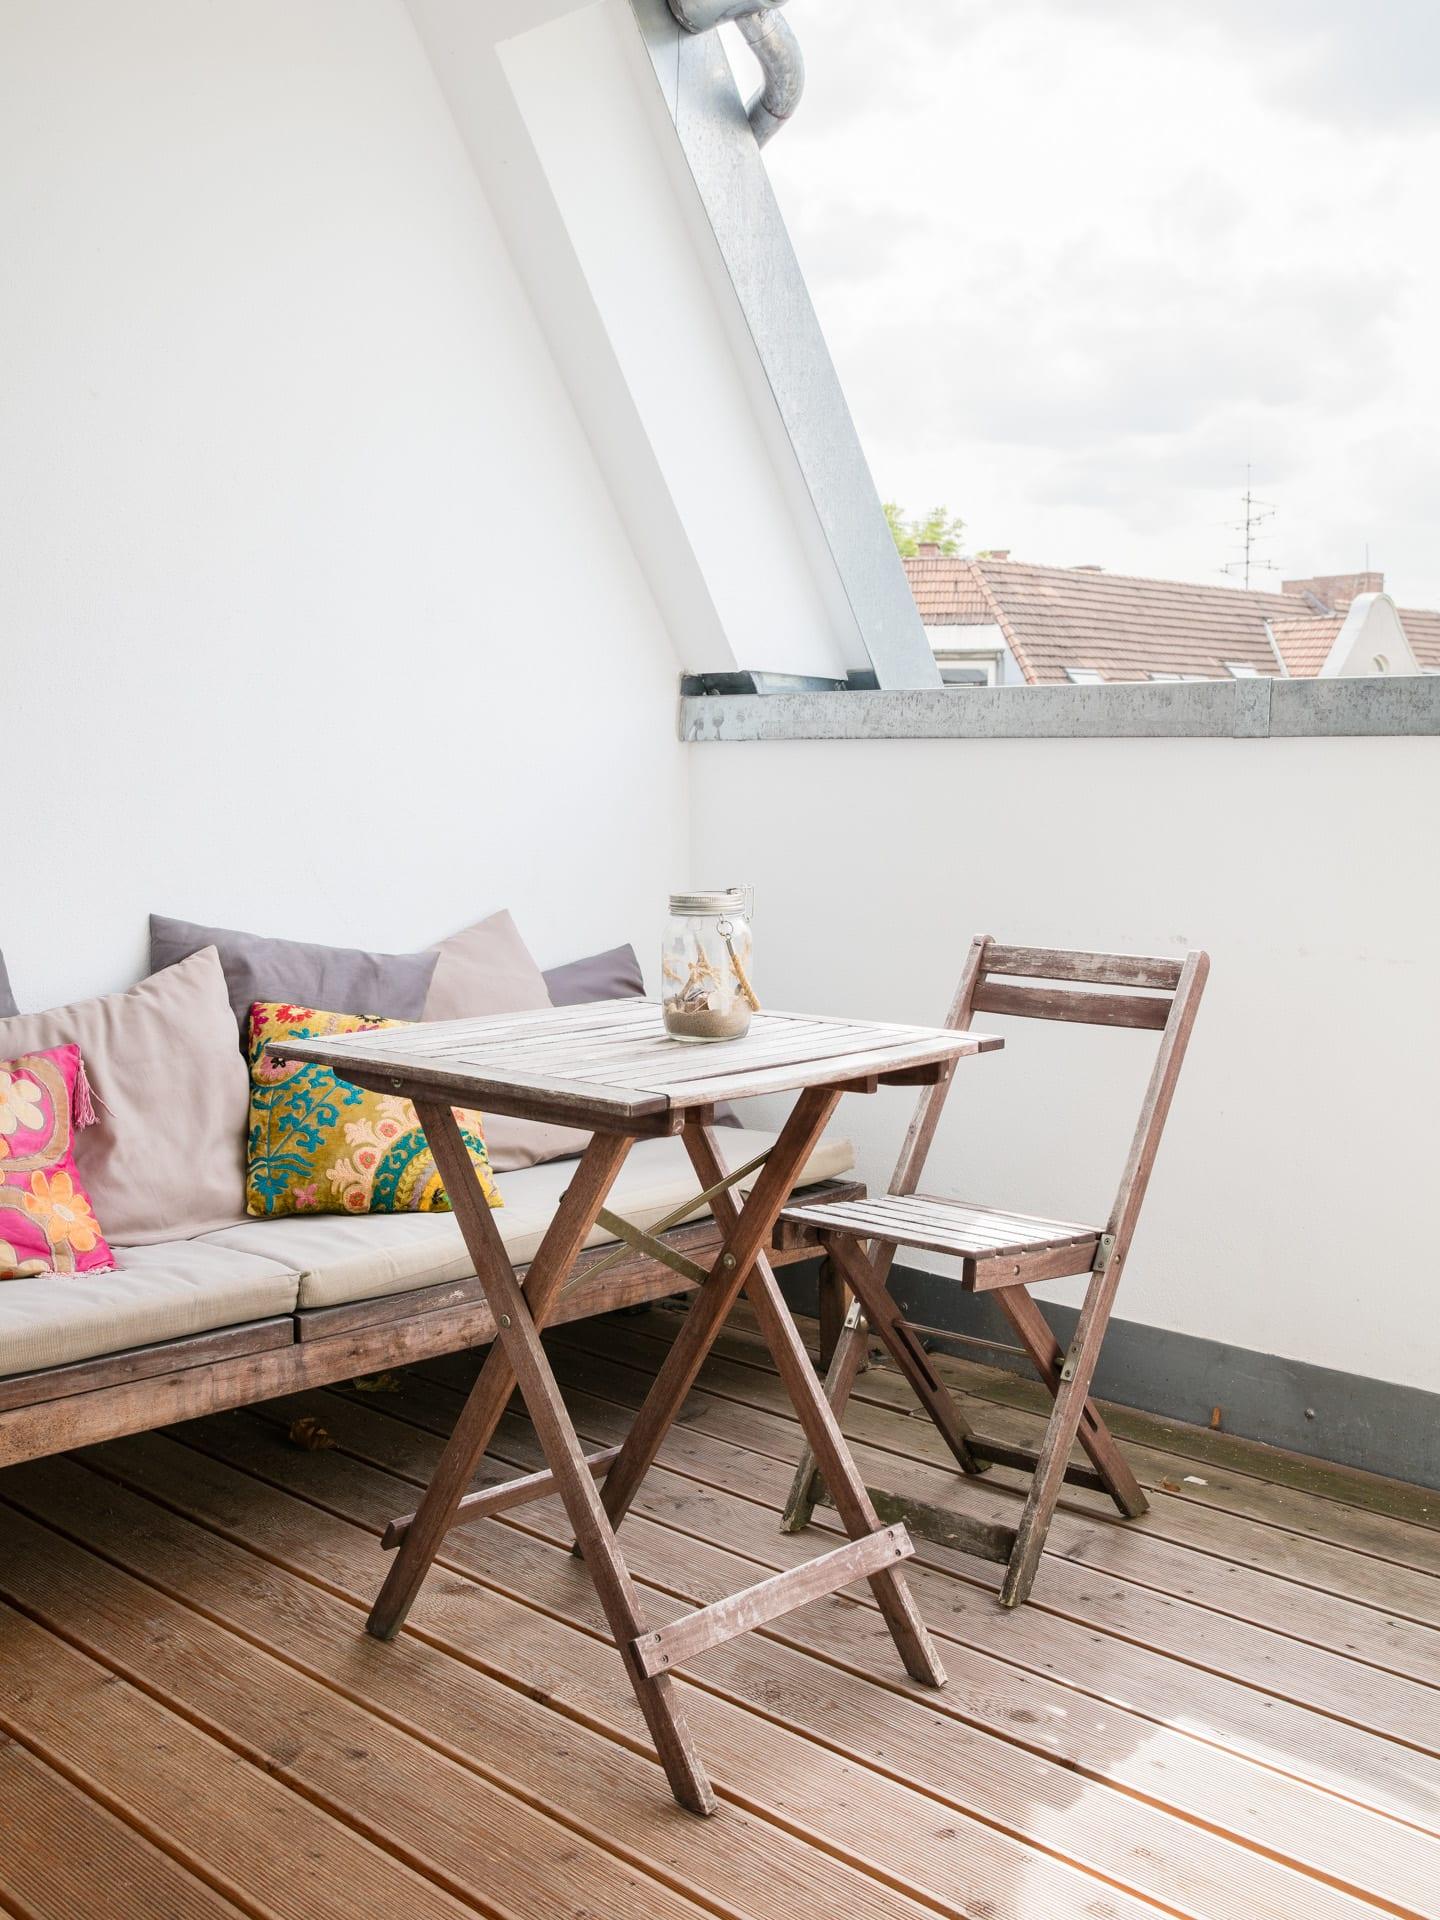 Prime Robert Beyer Architekten Klemens Renner Apartment R Beutiful Home Inspiration Cosmmahrainfo